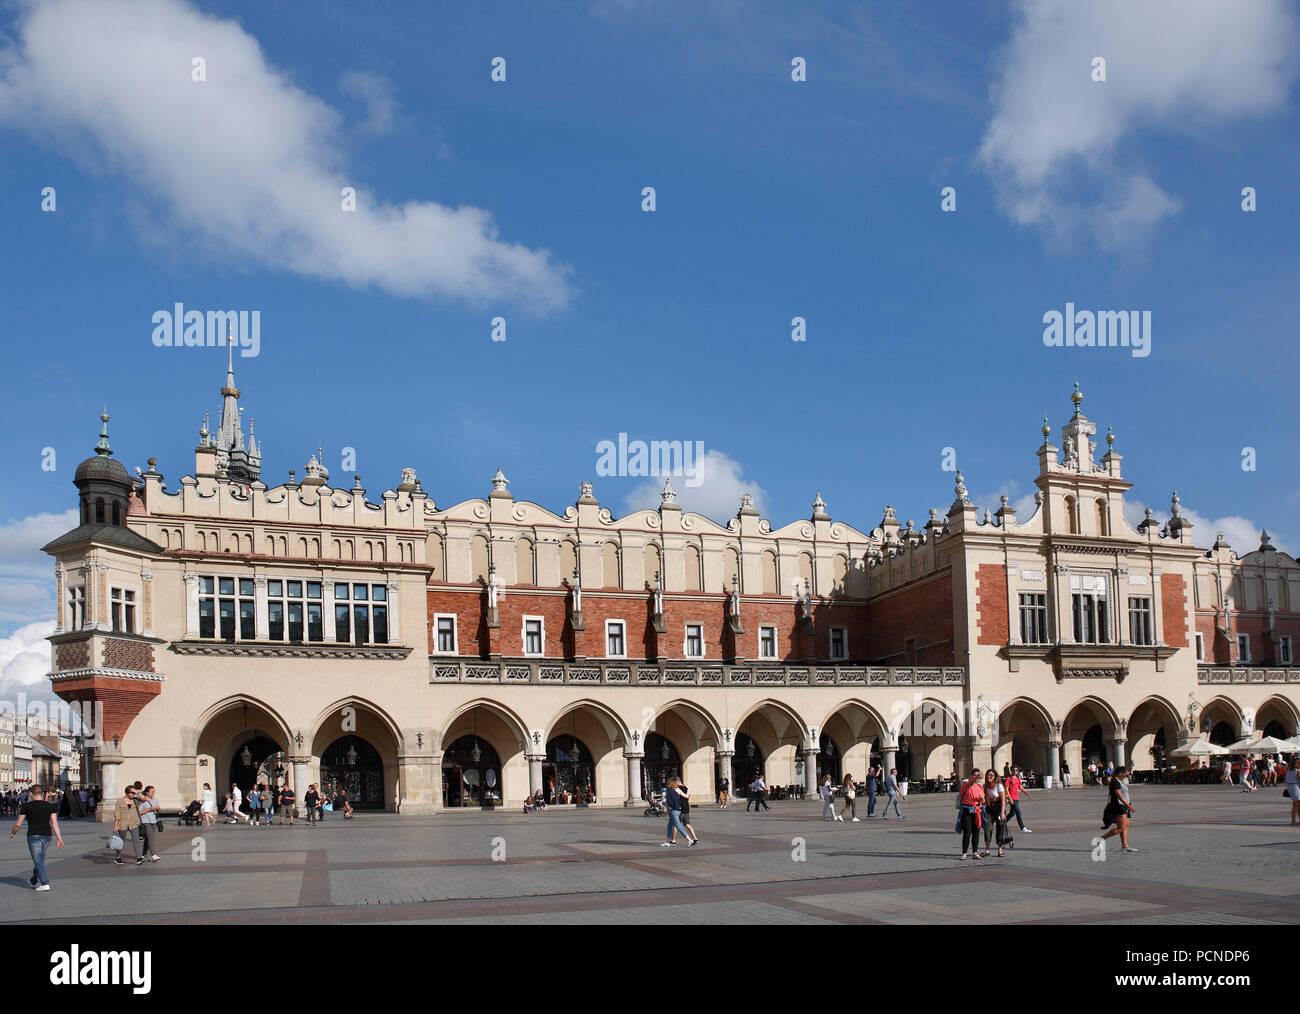 square infront of Cloth Hall. old town krakow, lesser poland, poland, europe Stock Photo